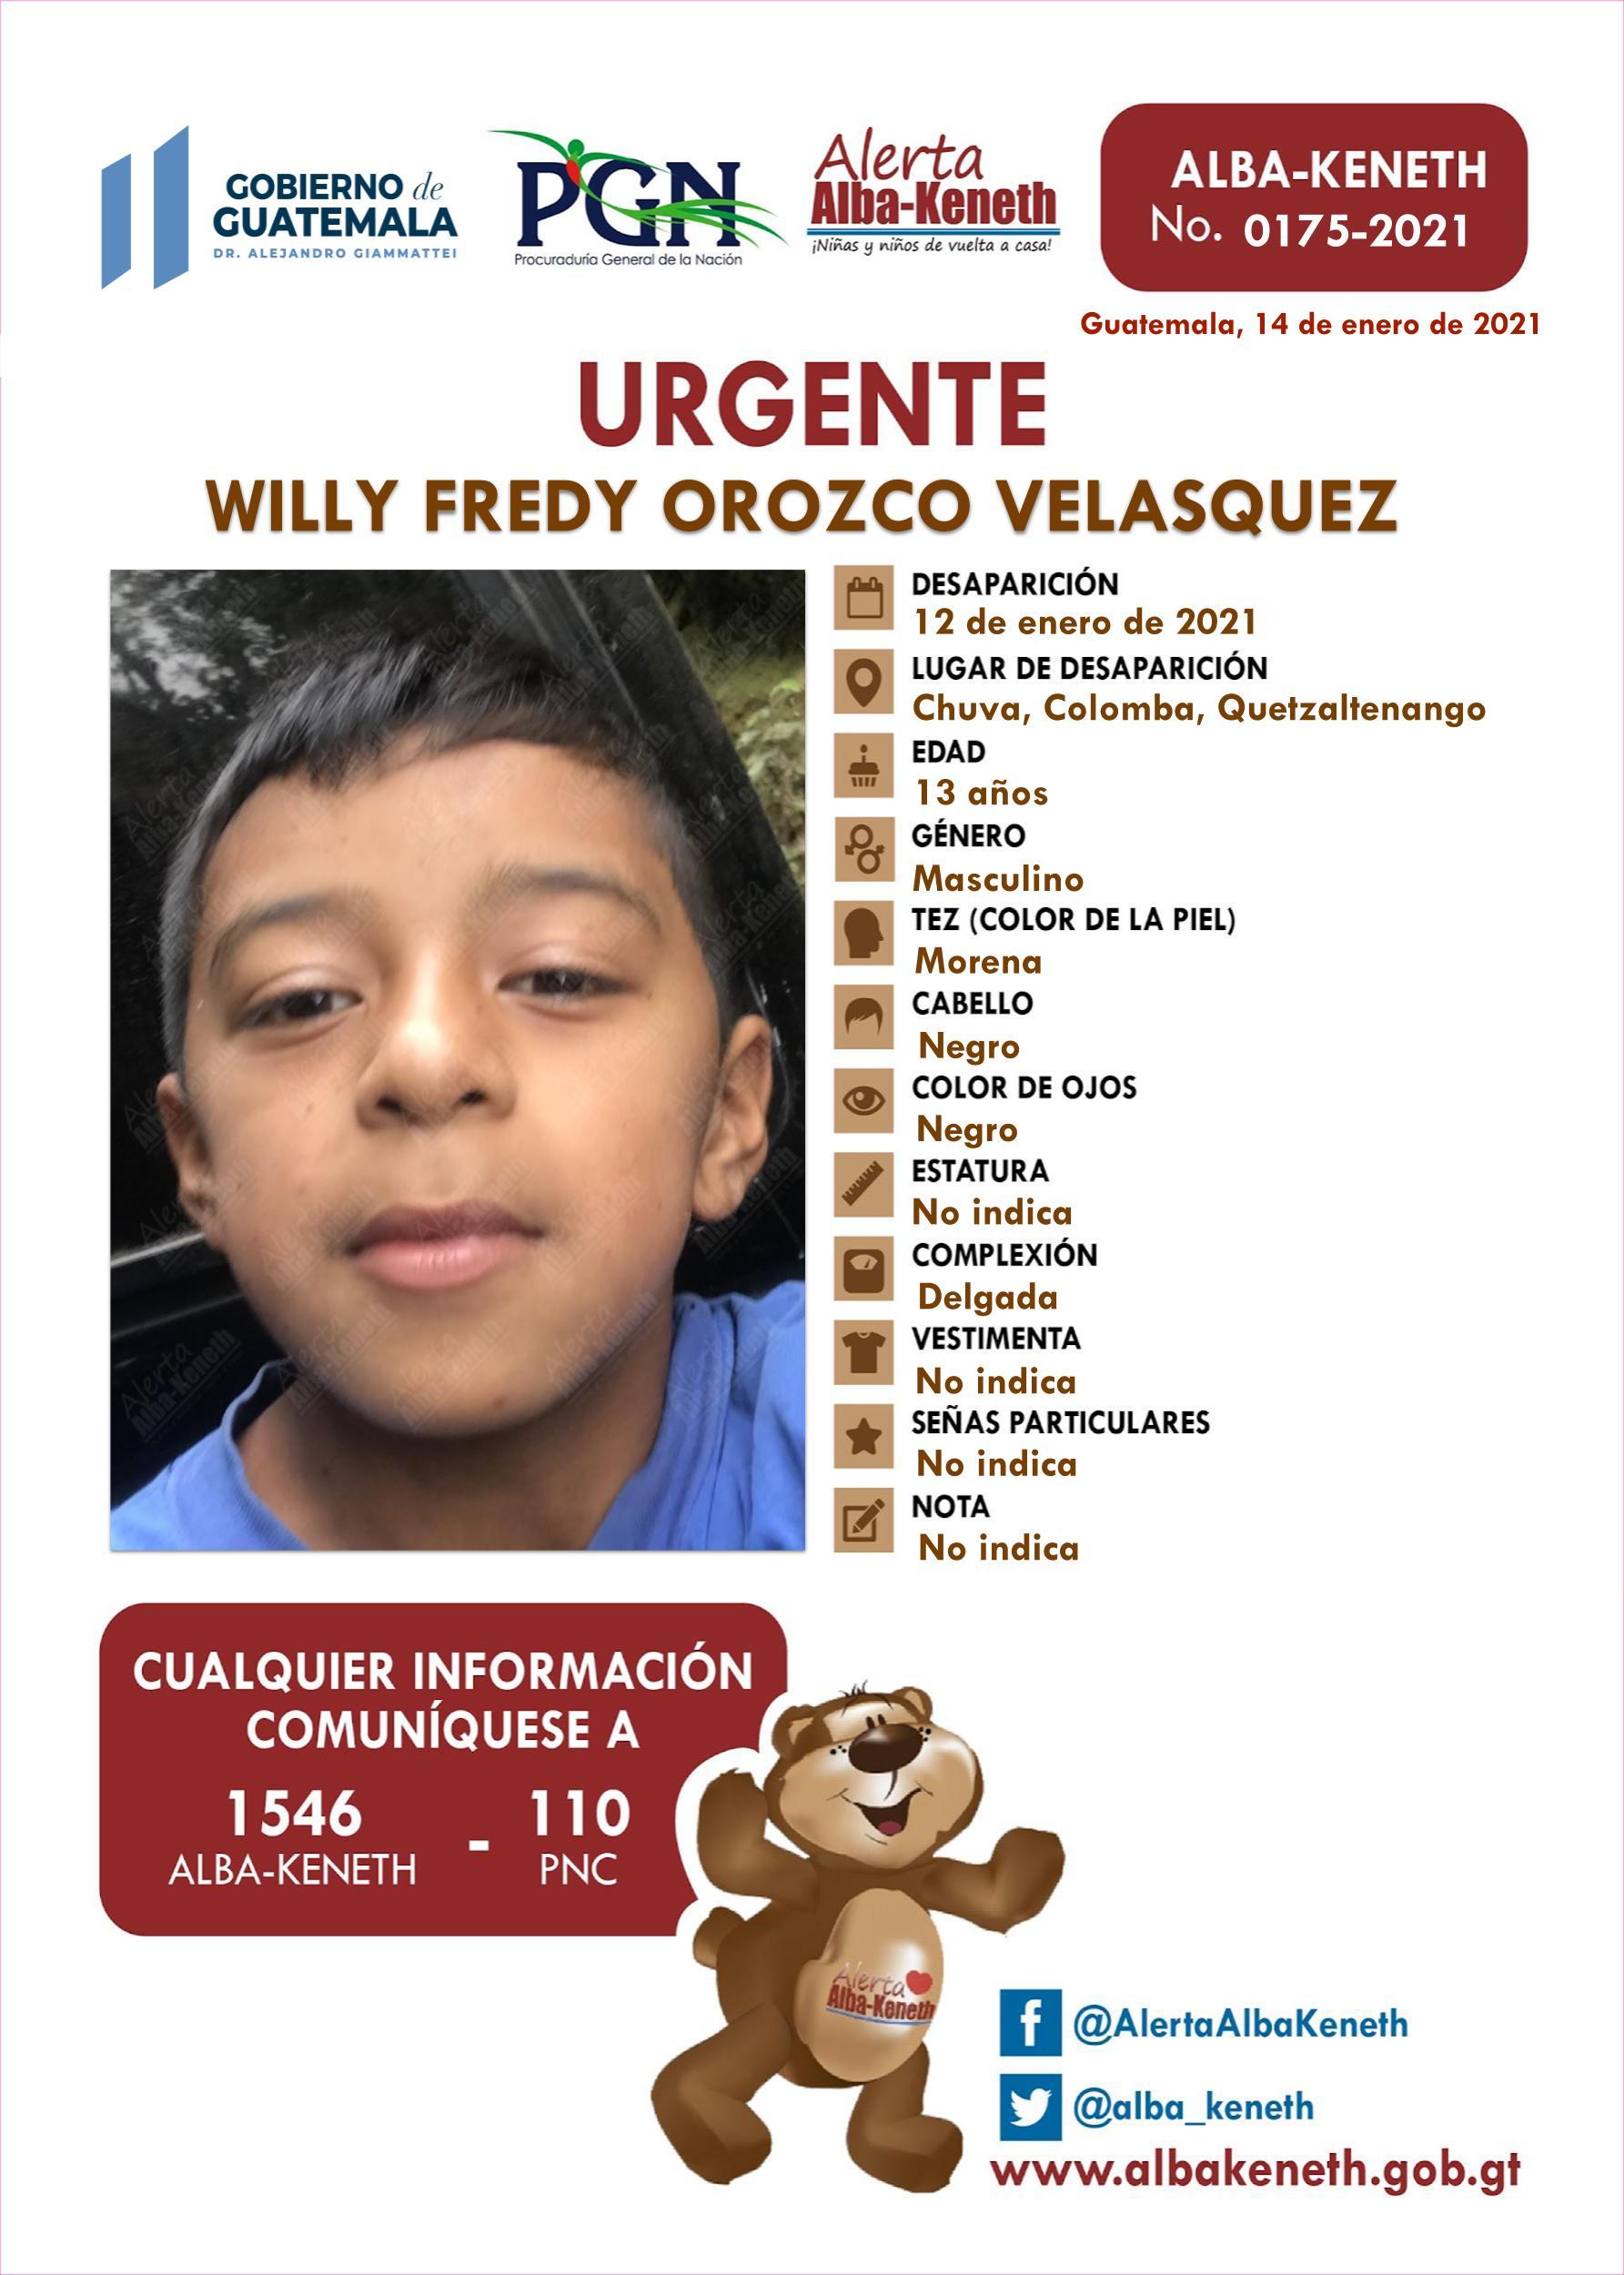 Willy Fredy Orozco Velasquez